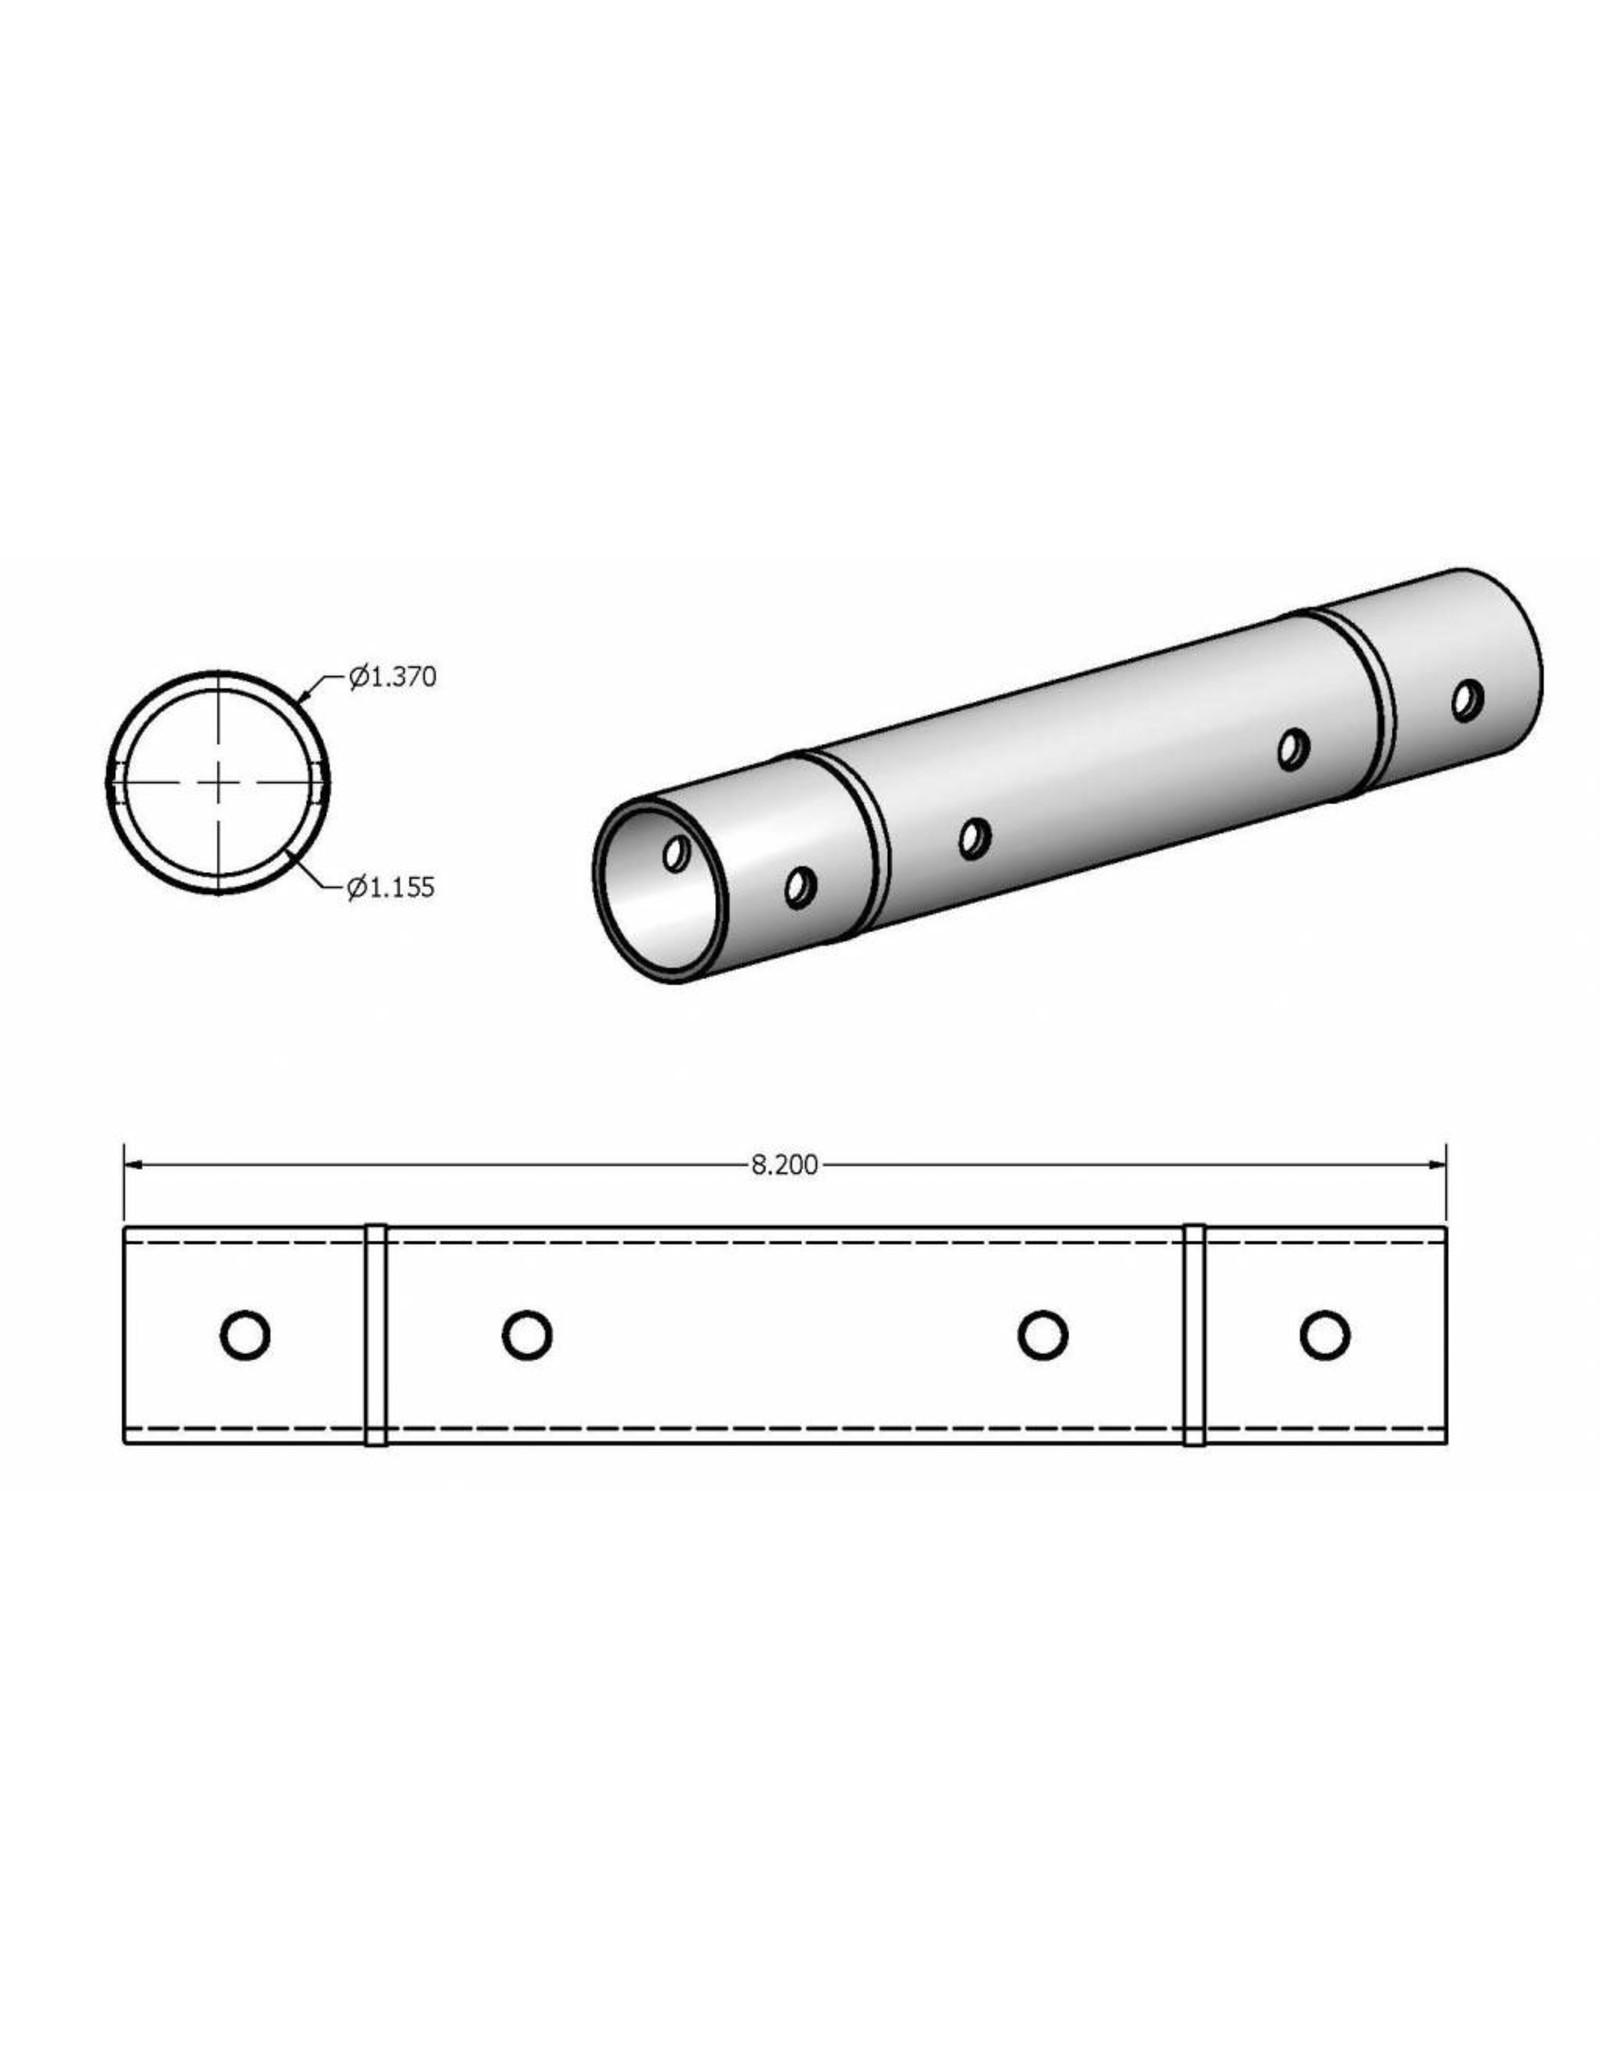 KMT Style Liner, HP Cylinder, Plastic, SLV, 75S/100S, Single Inlet